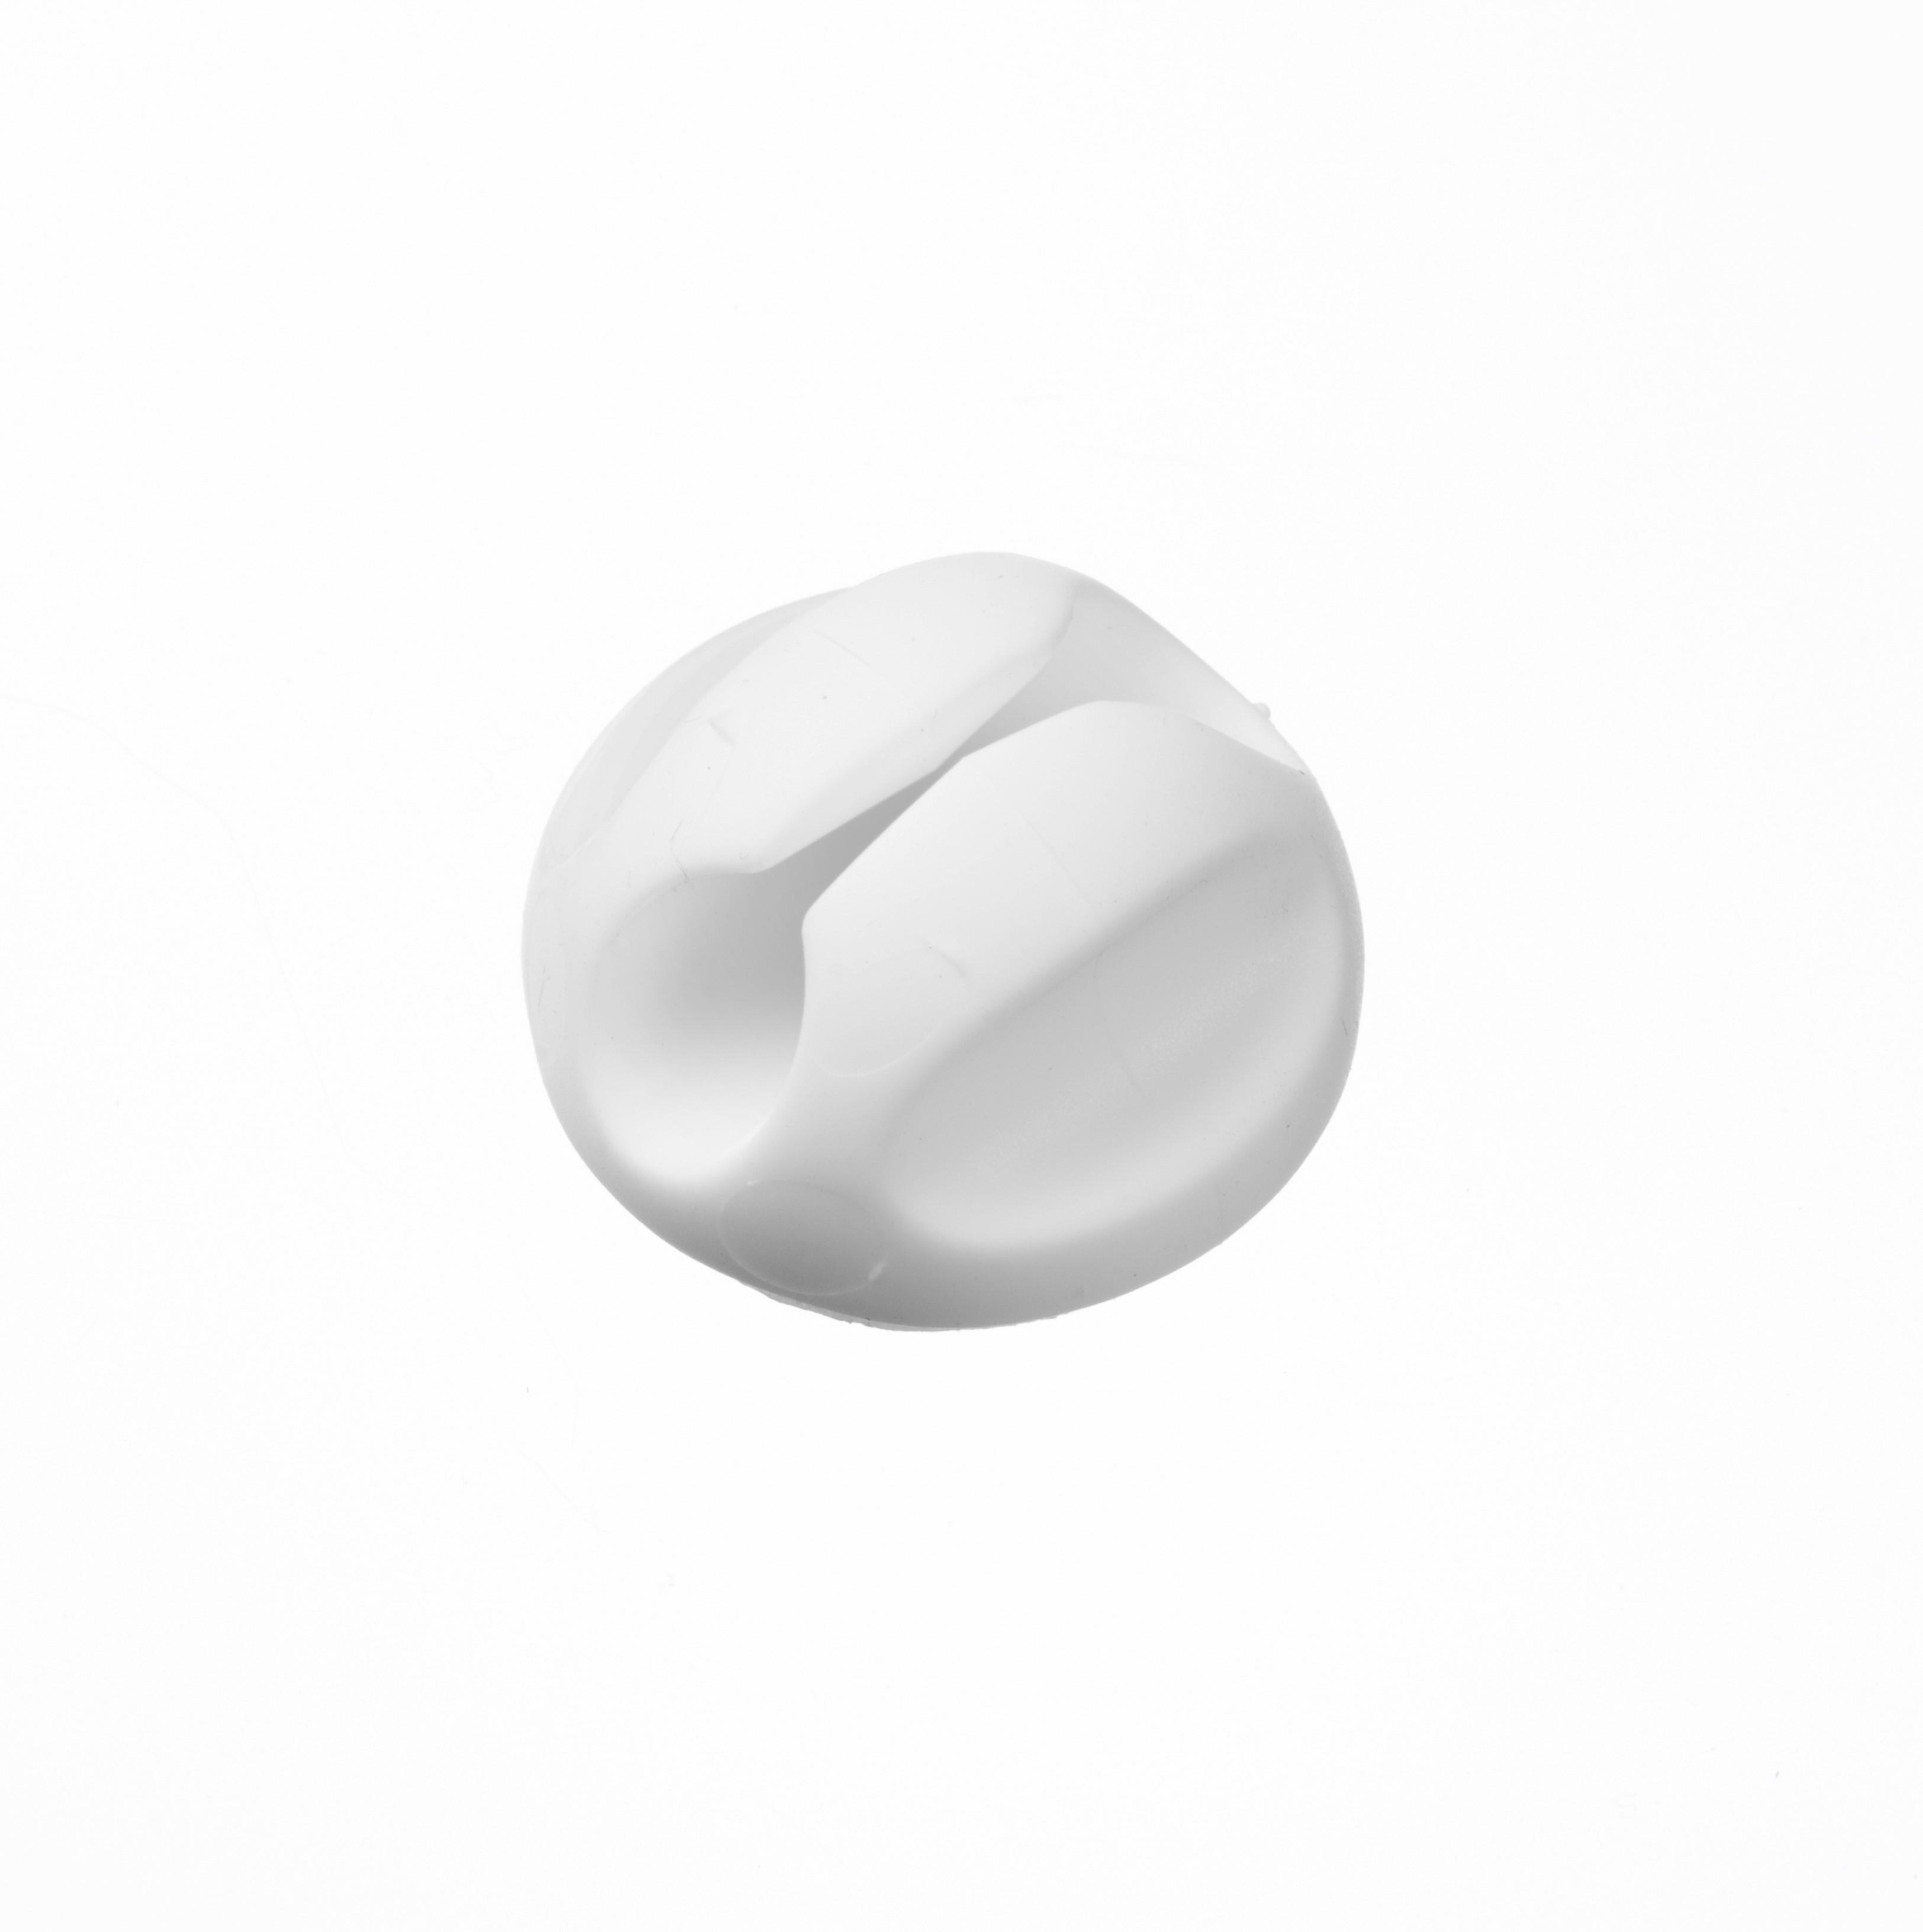 Base câble Tidy D-line - Blanc